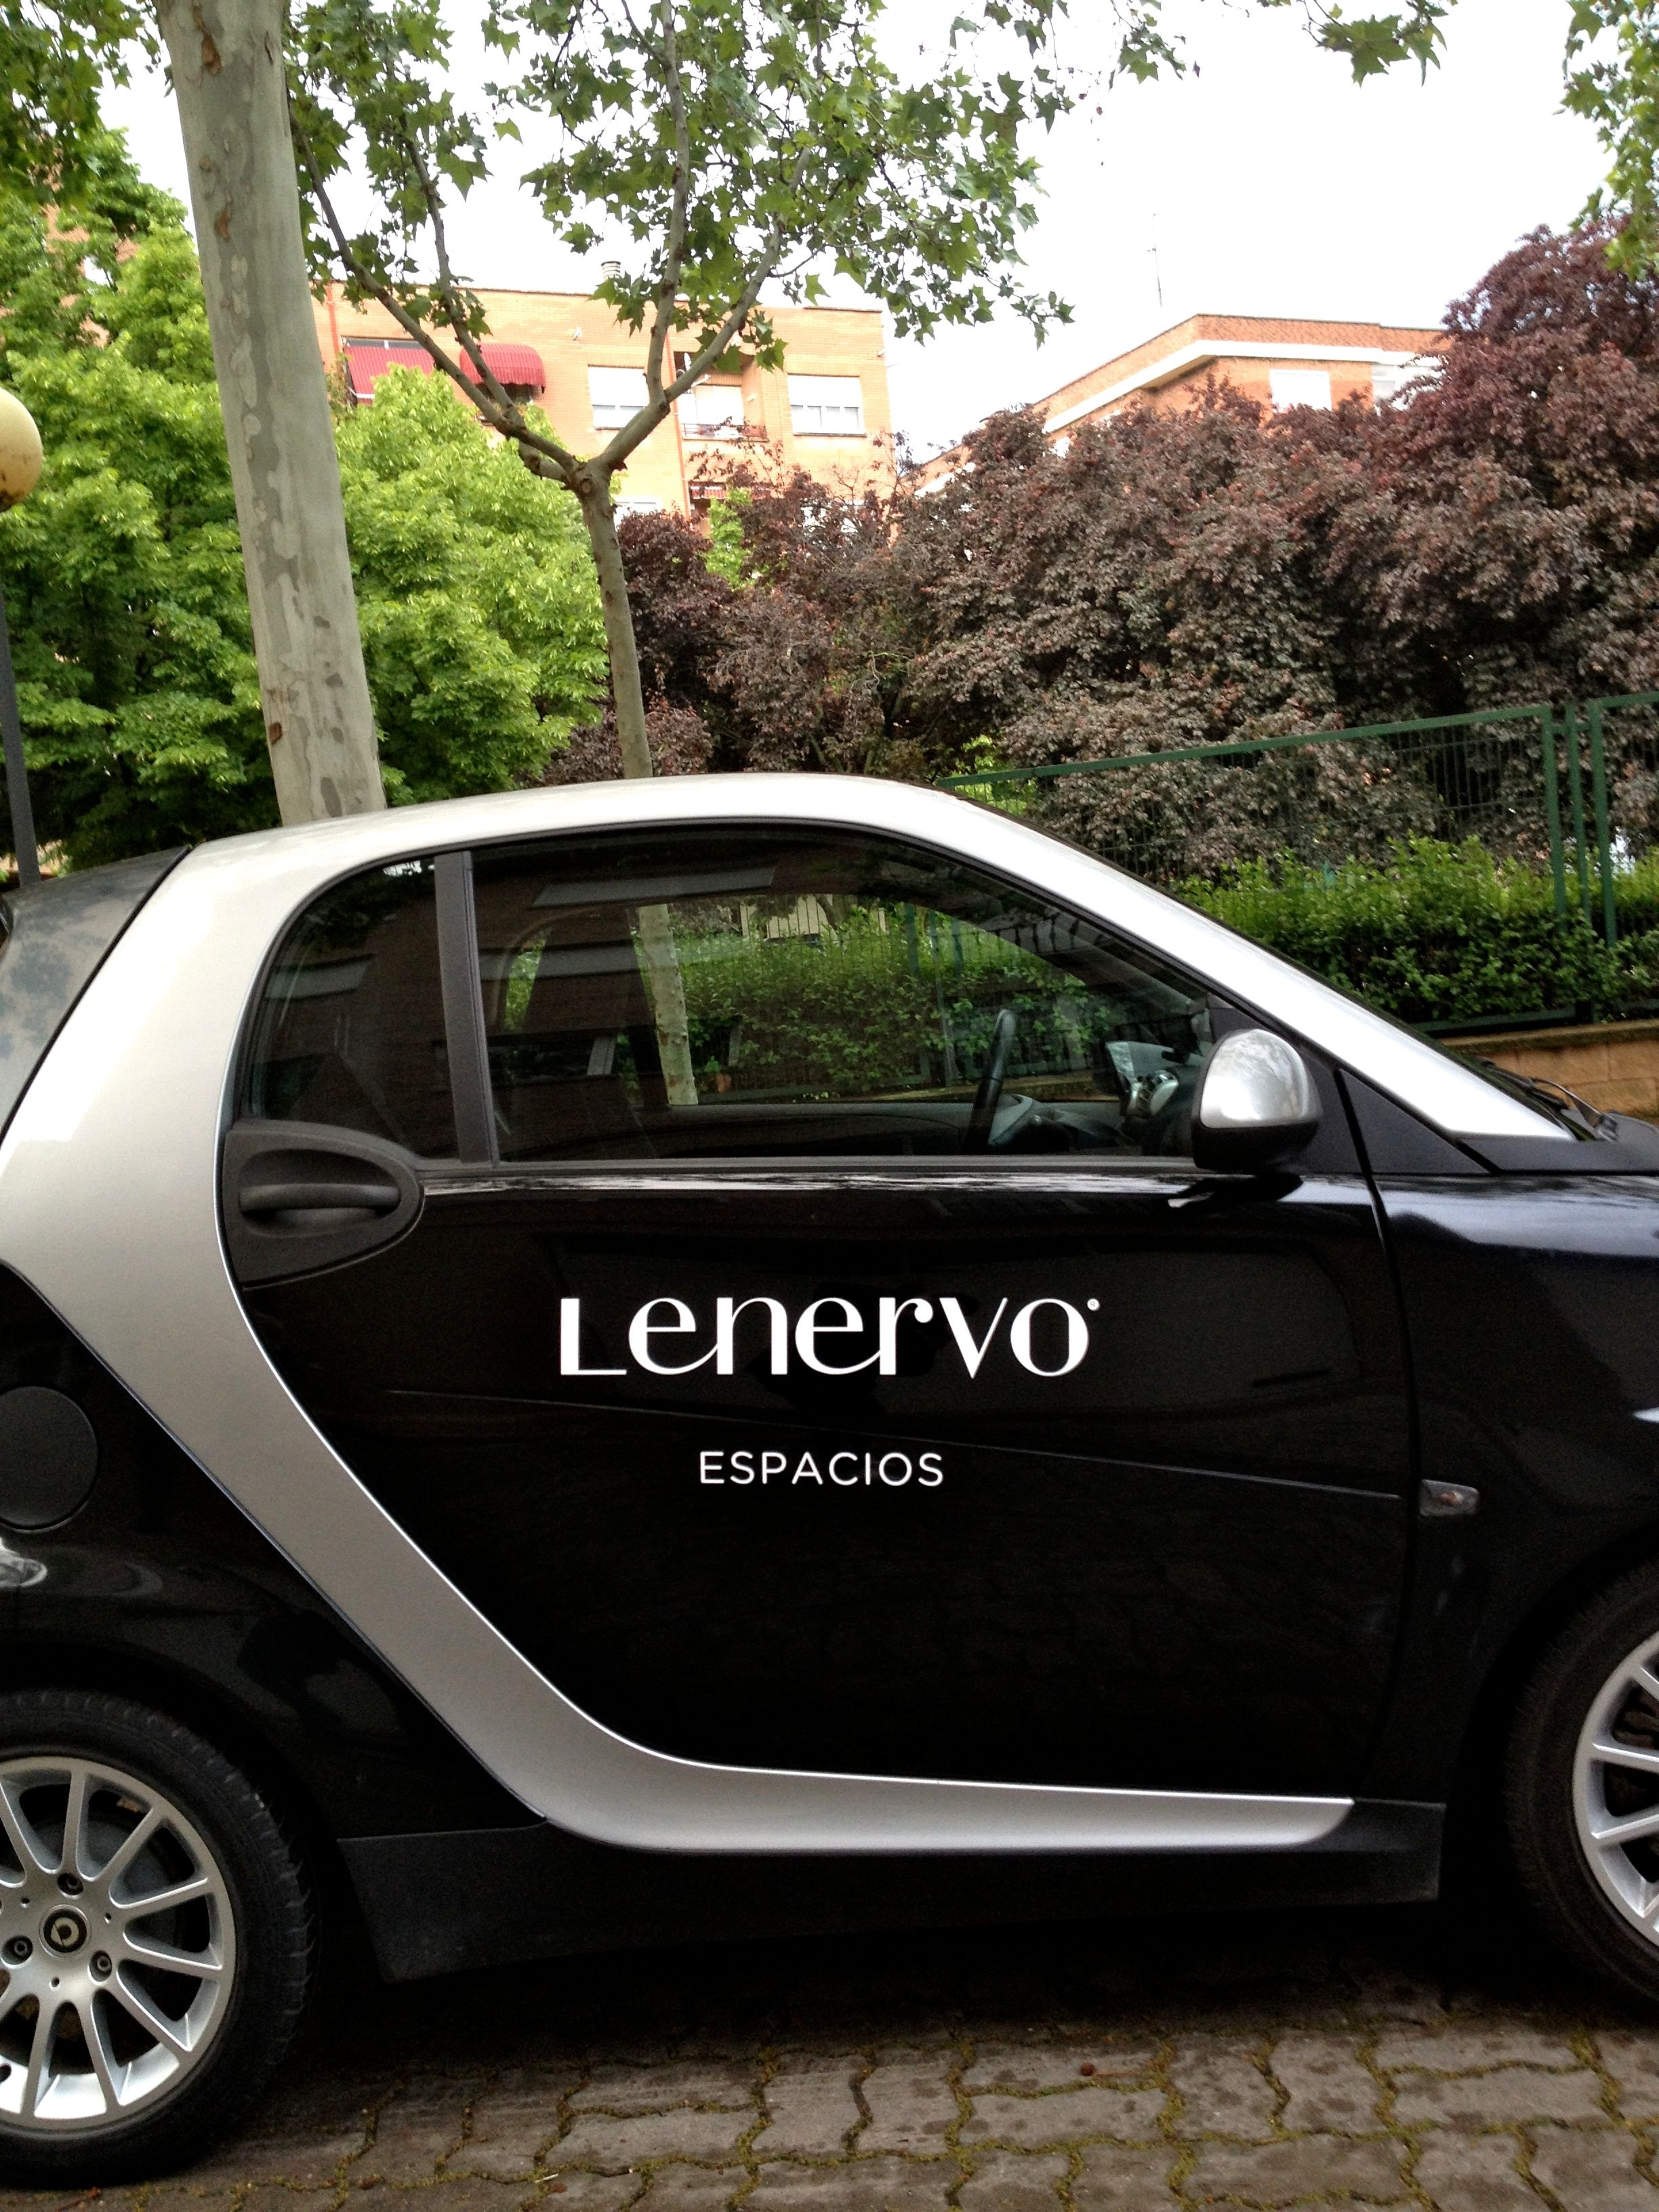 commercial vehicle. #lenervostyle  Quality & Design